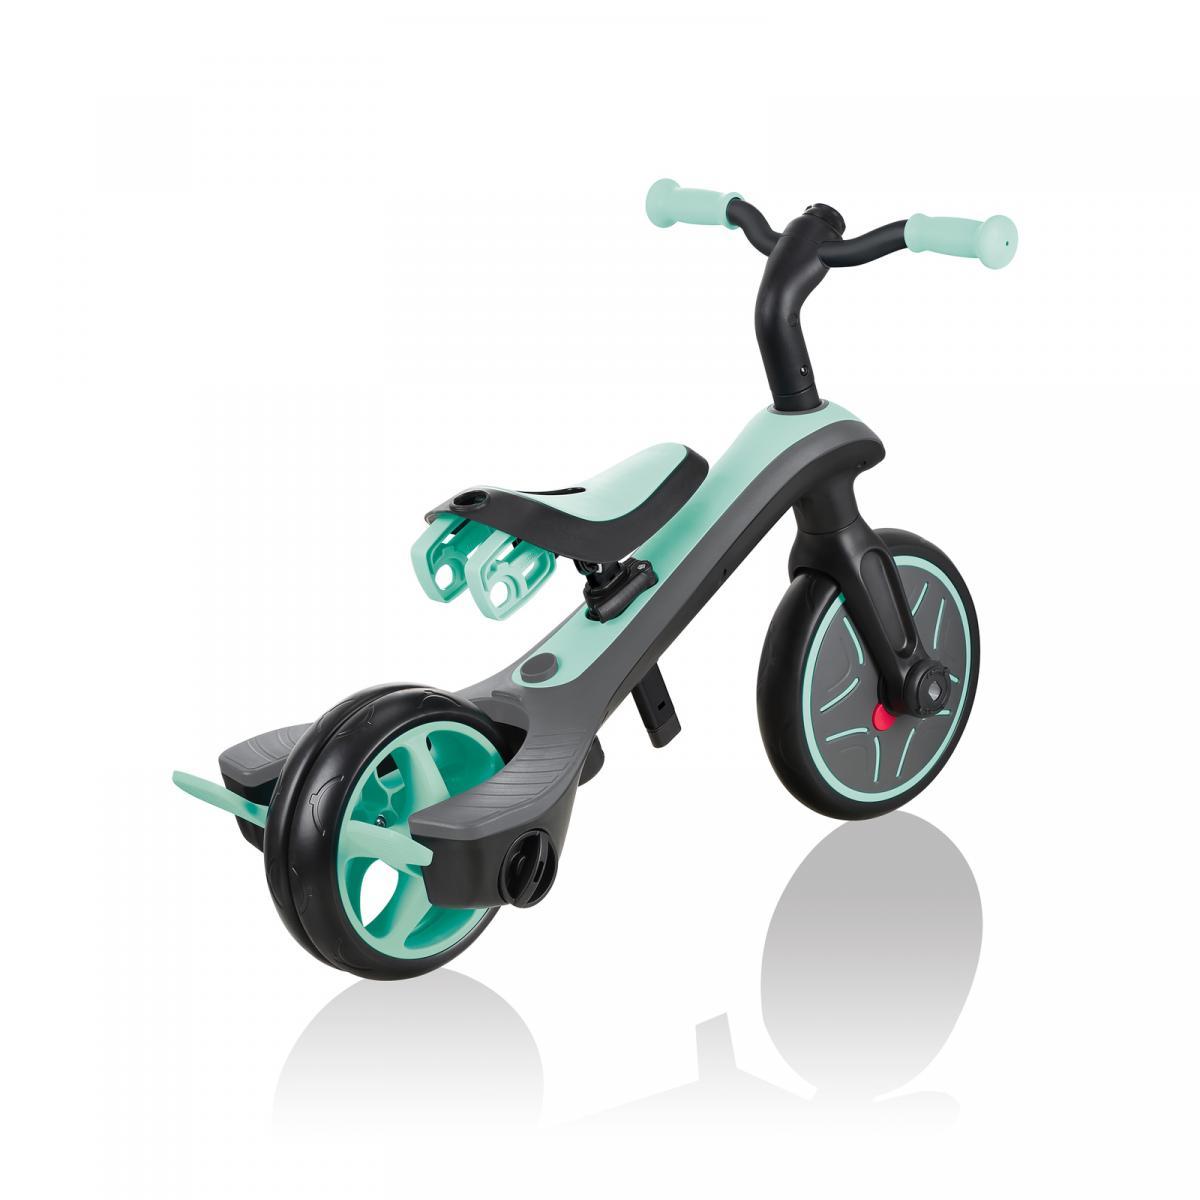 Globber All in one Trike